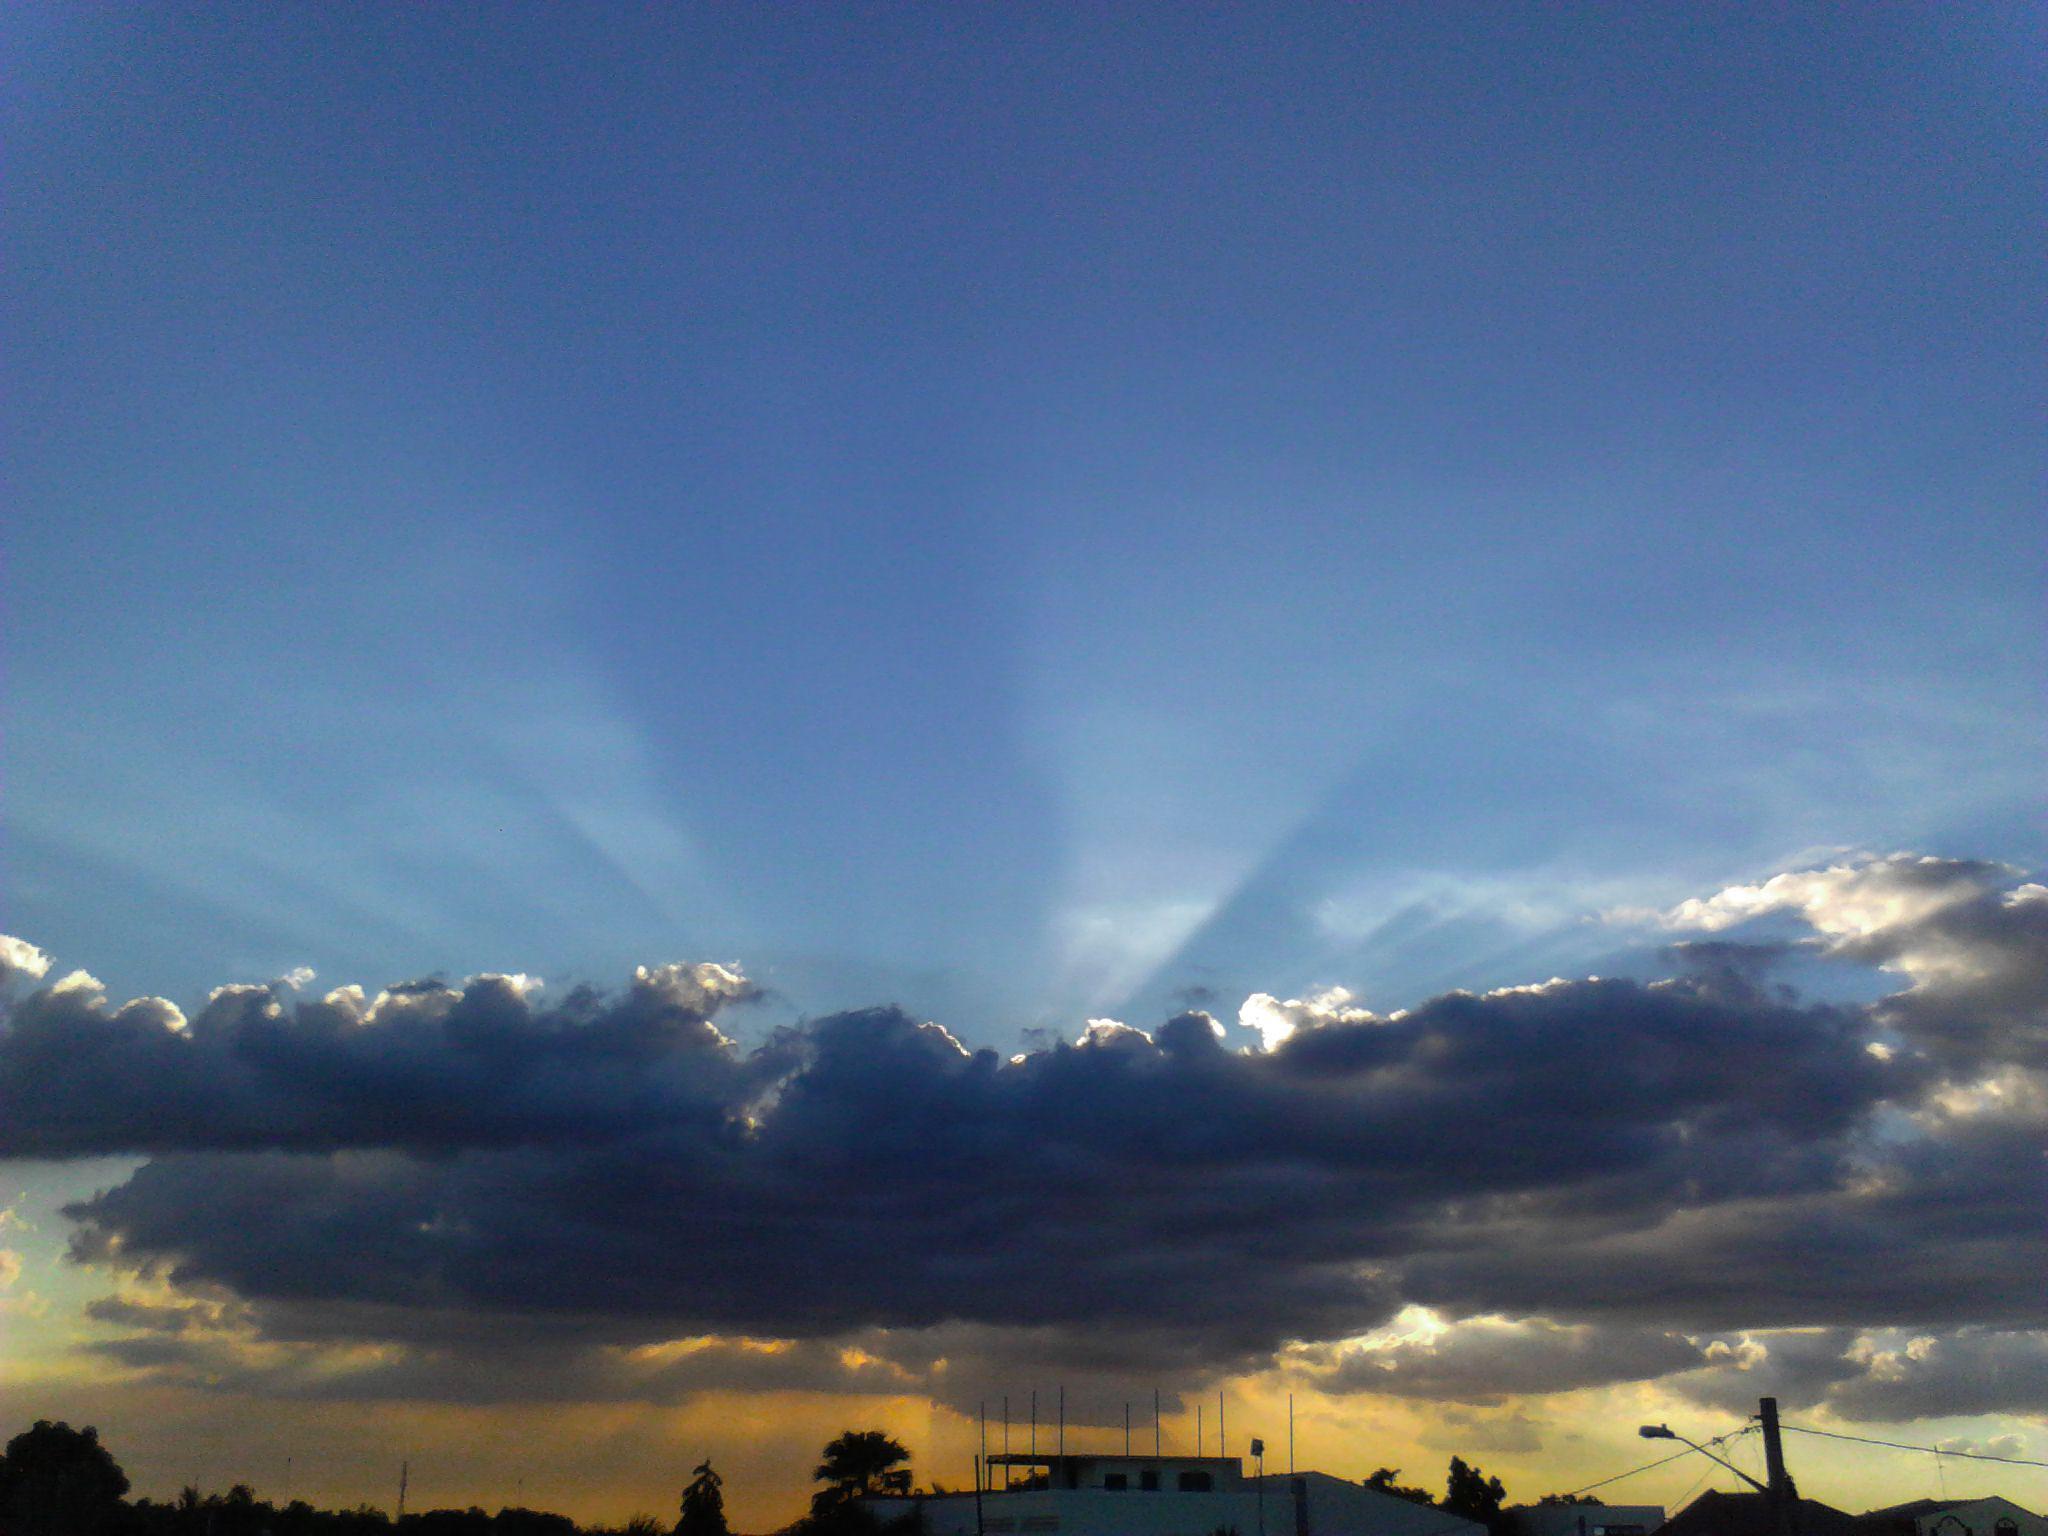 Heavenly by lfelicitas27